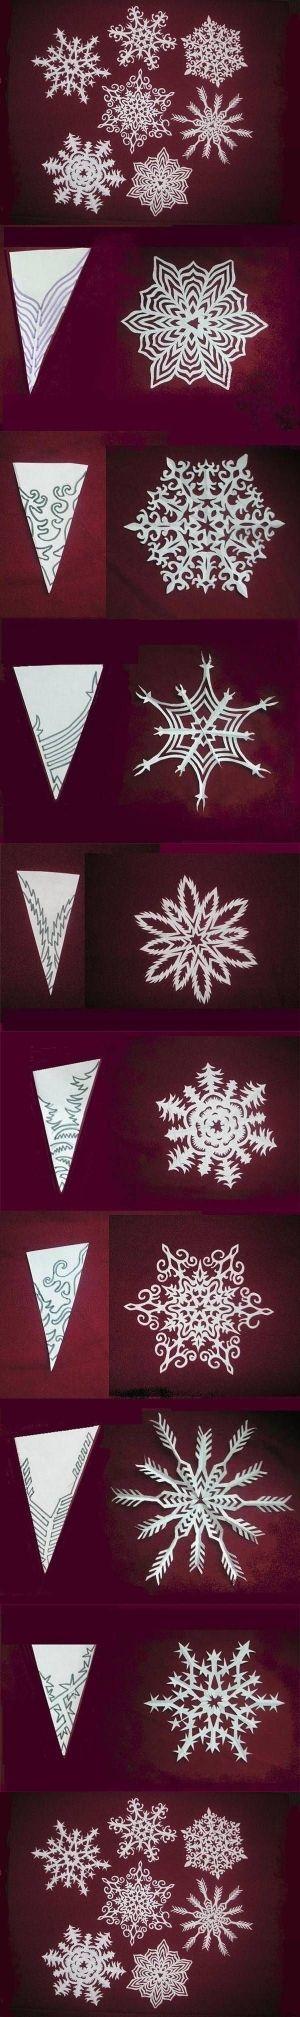 DIY Snowflakes Paper Pattern Tutorial by susieQ:)